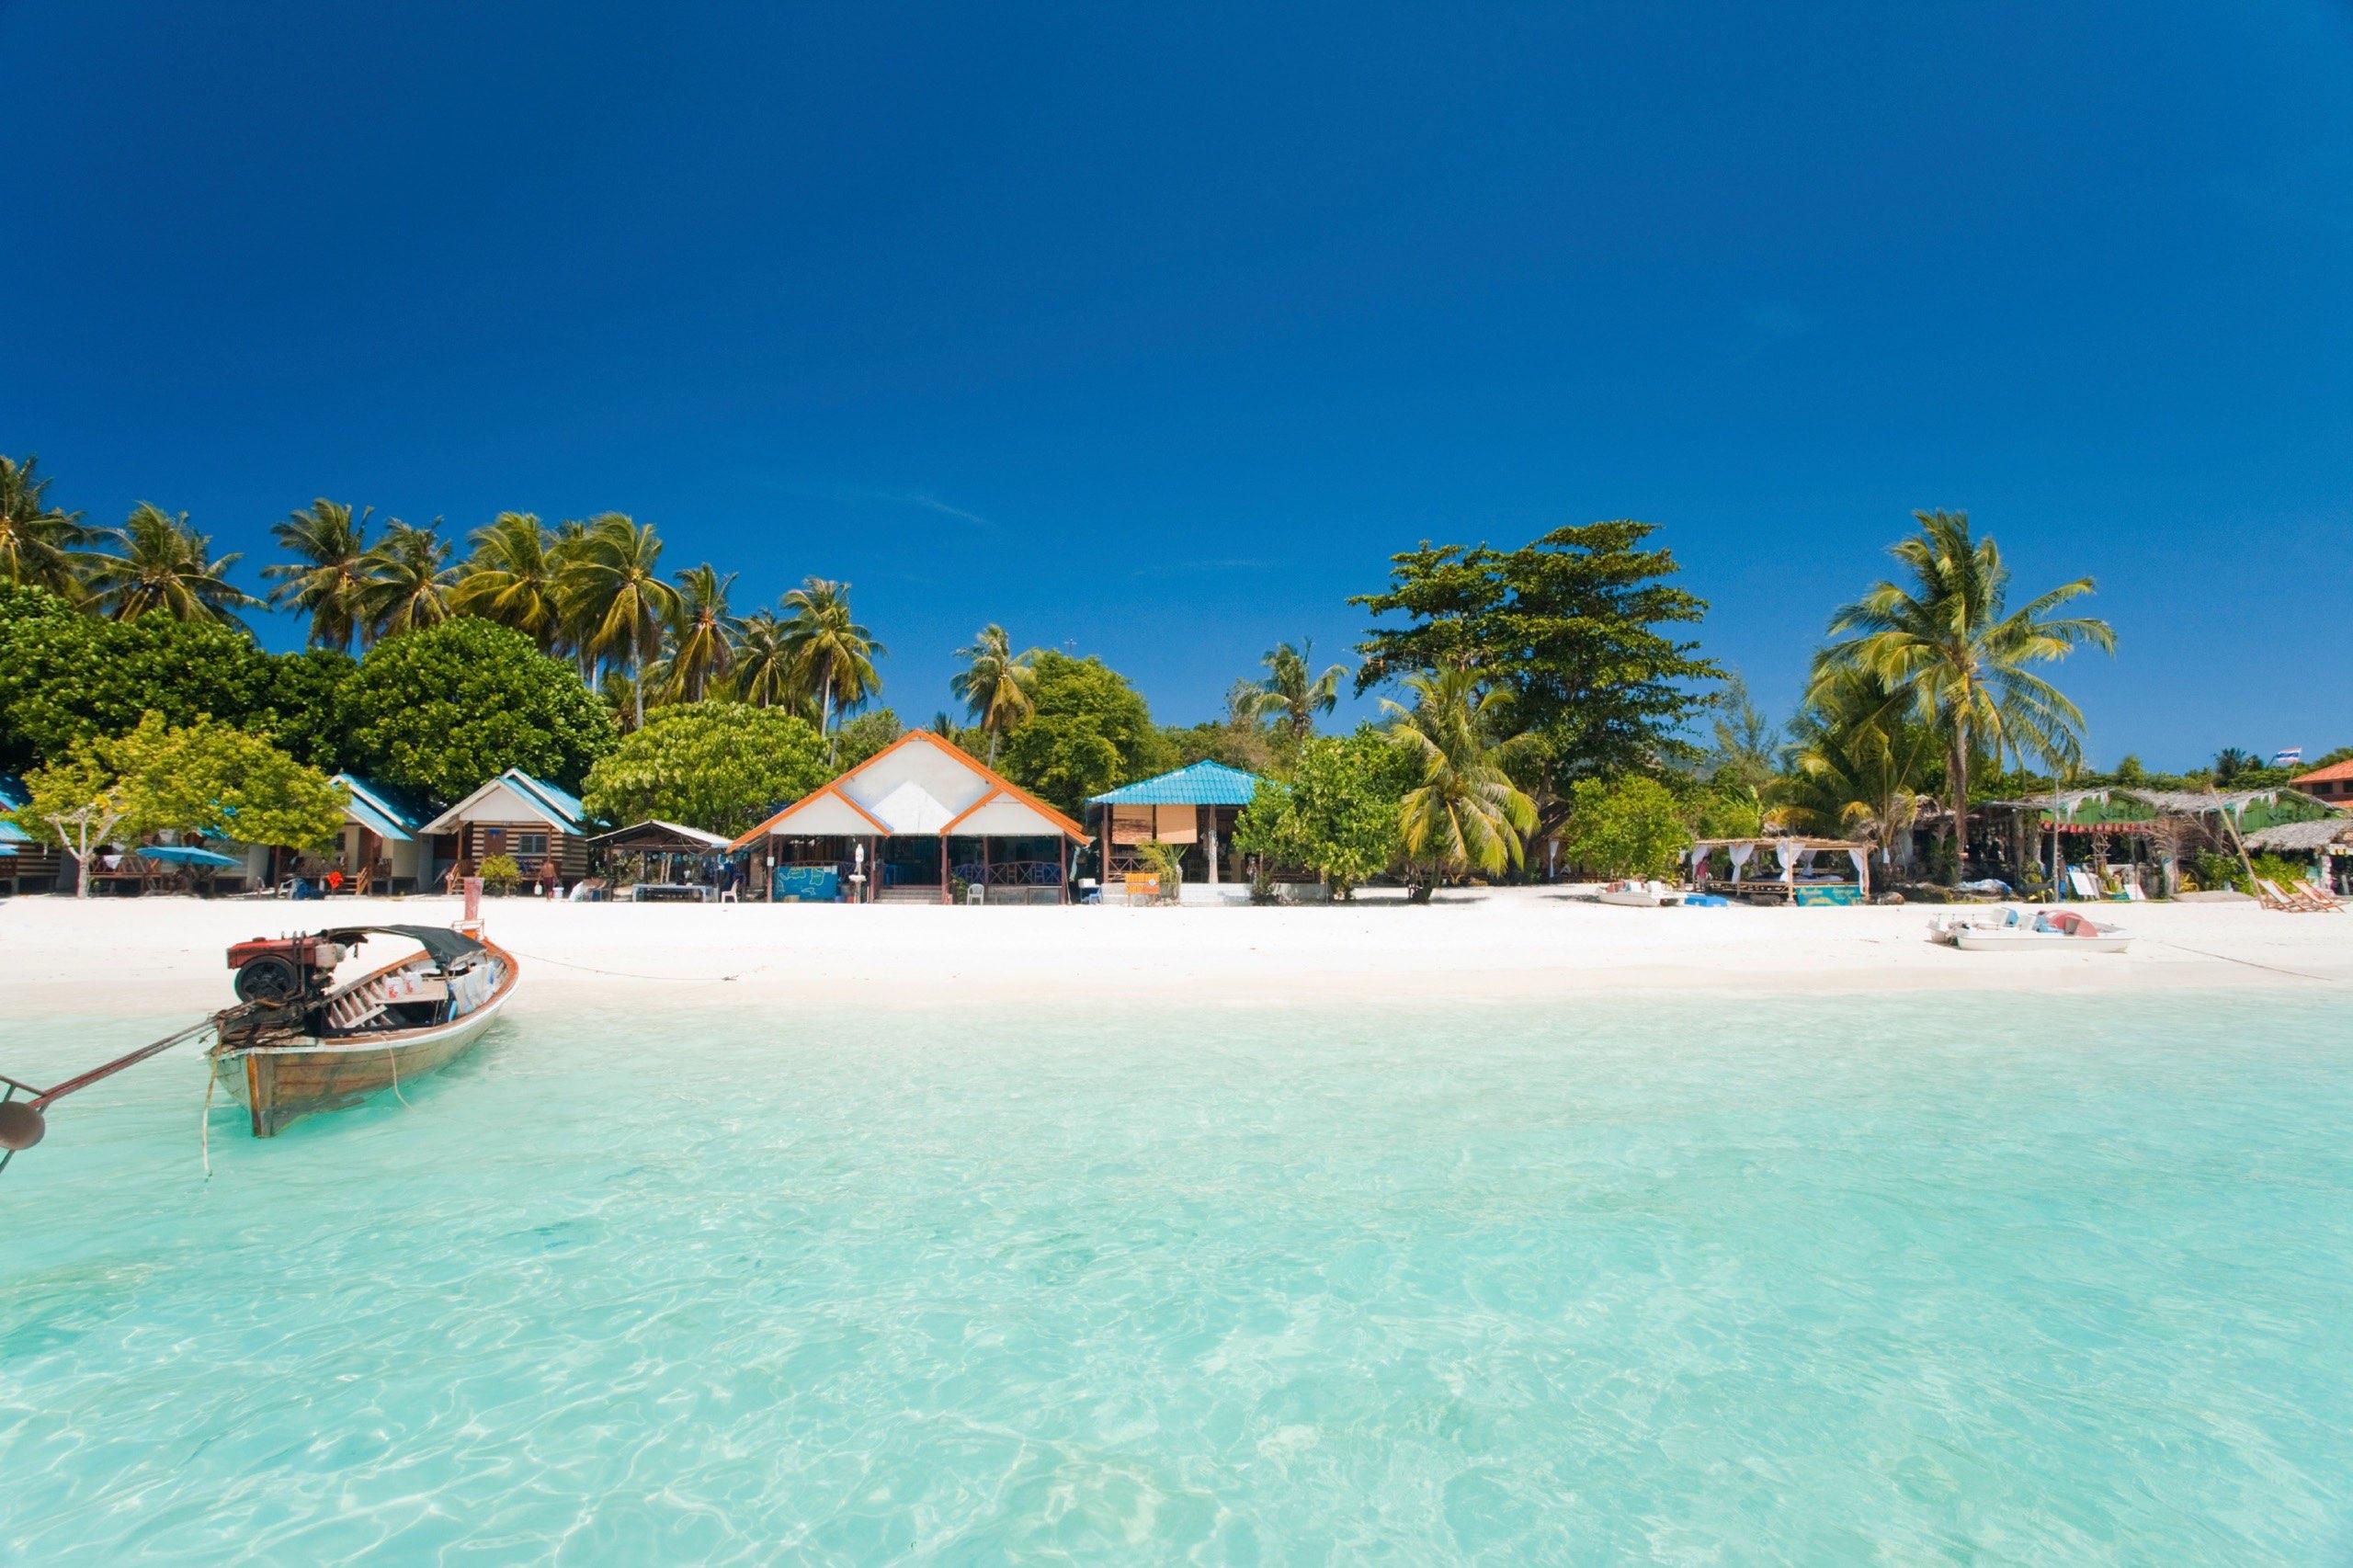 Island guide: Koh Lipe, the Maldives of Thailand